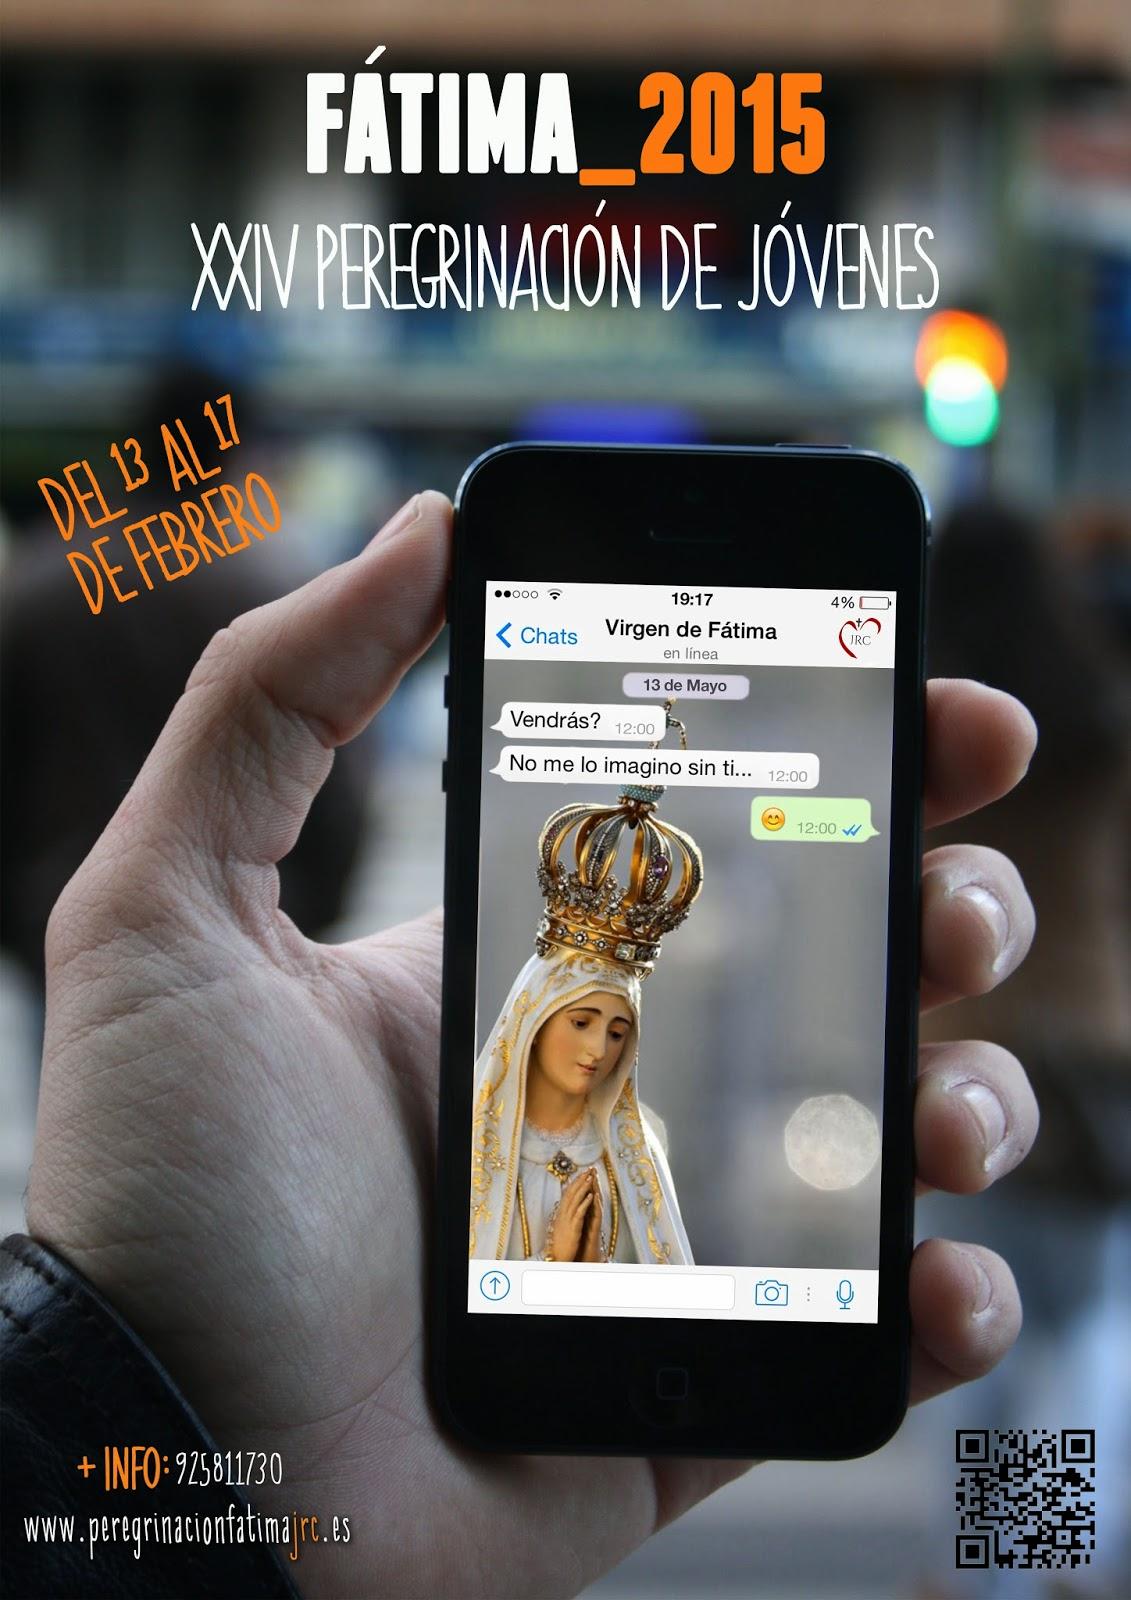 http://www.peregrinacionfatimajrc.es/index.php?option=com_content&view=article&id=96&Itemid=106